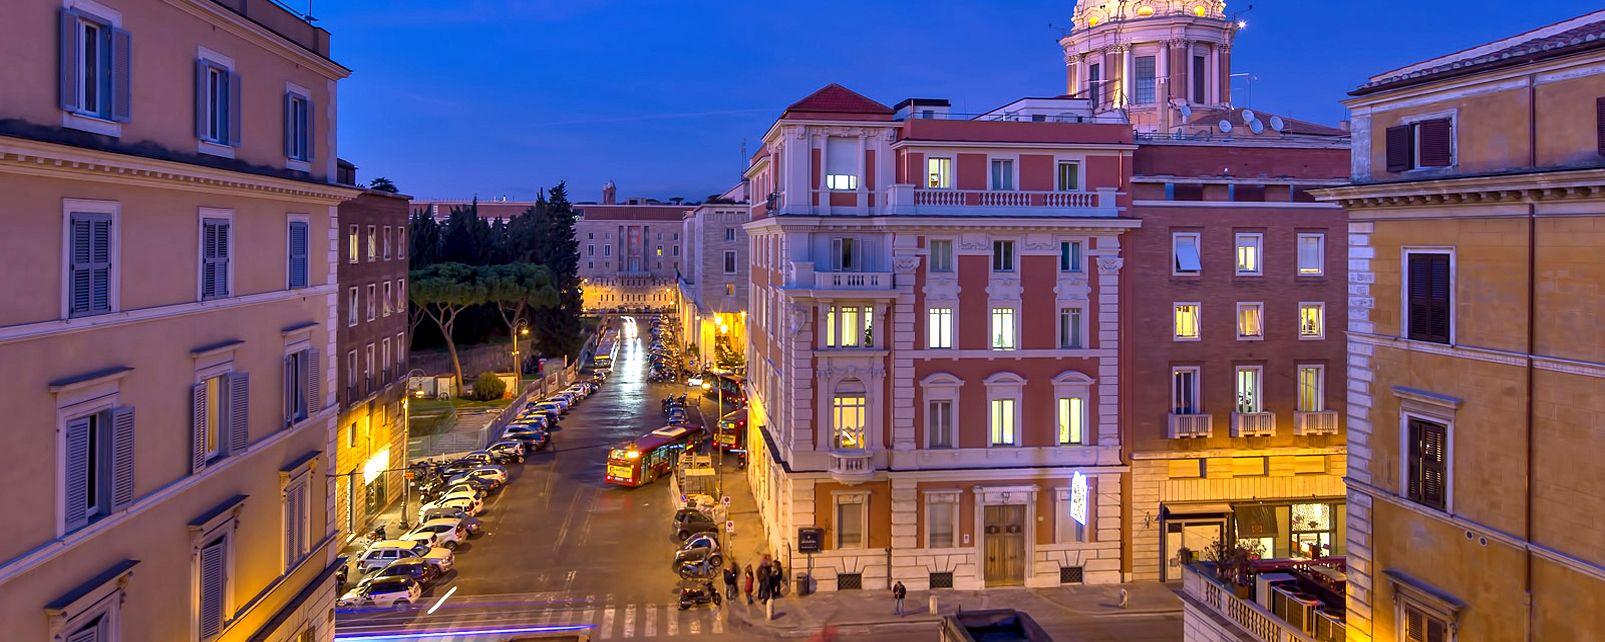 Hôtel J.K. Place Roma